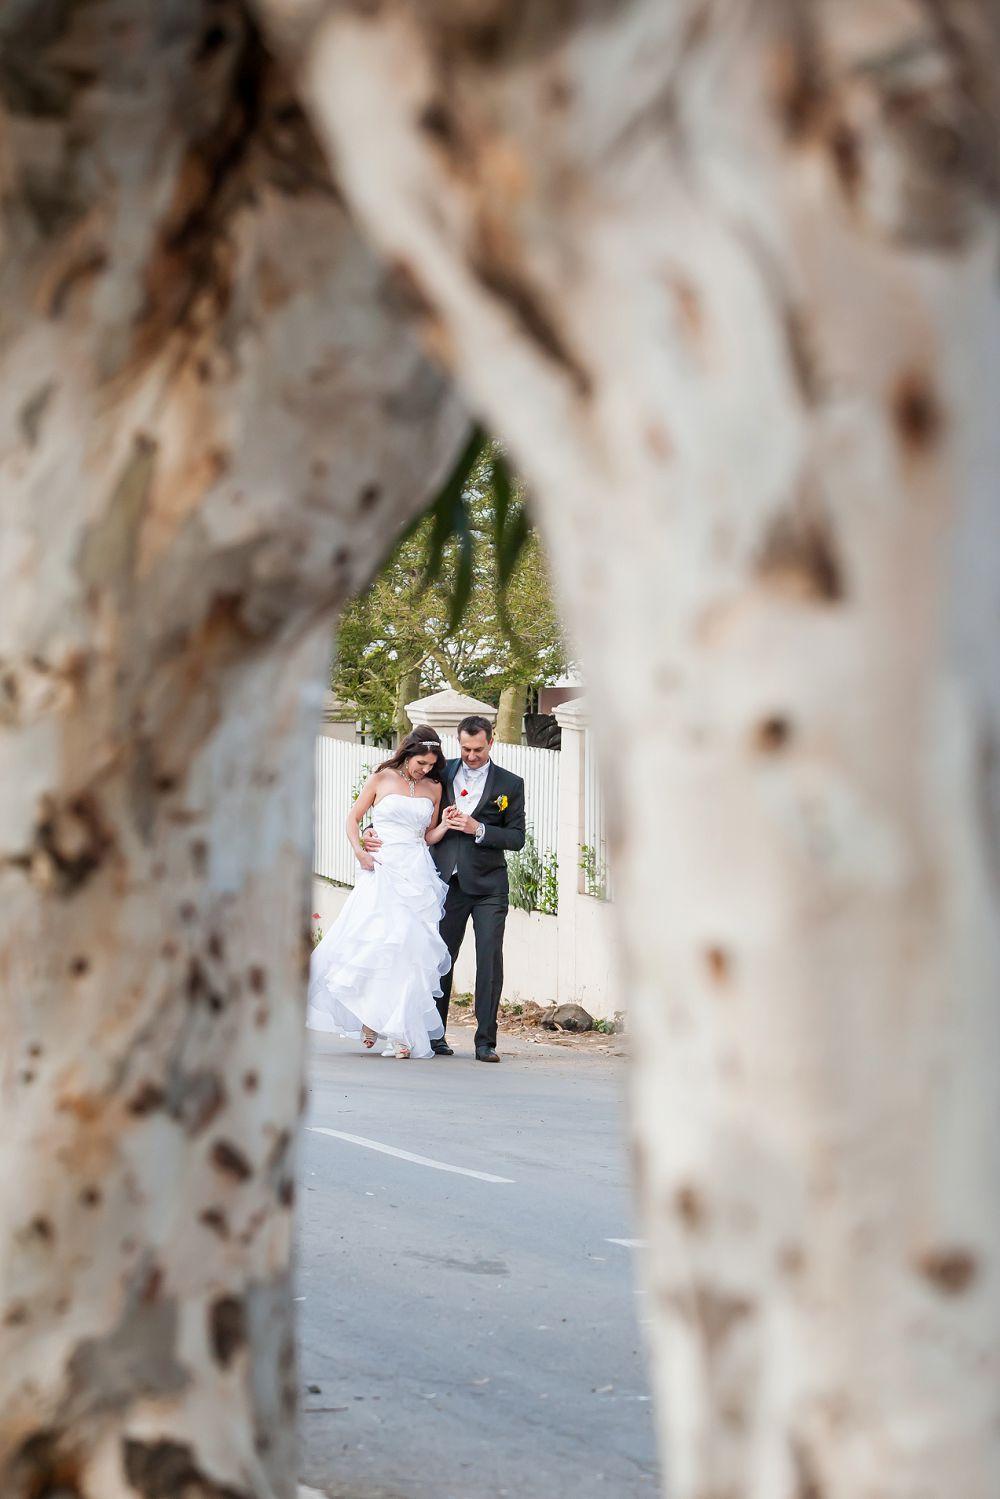 De Malle Meul Wedding Expressions Photography077